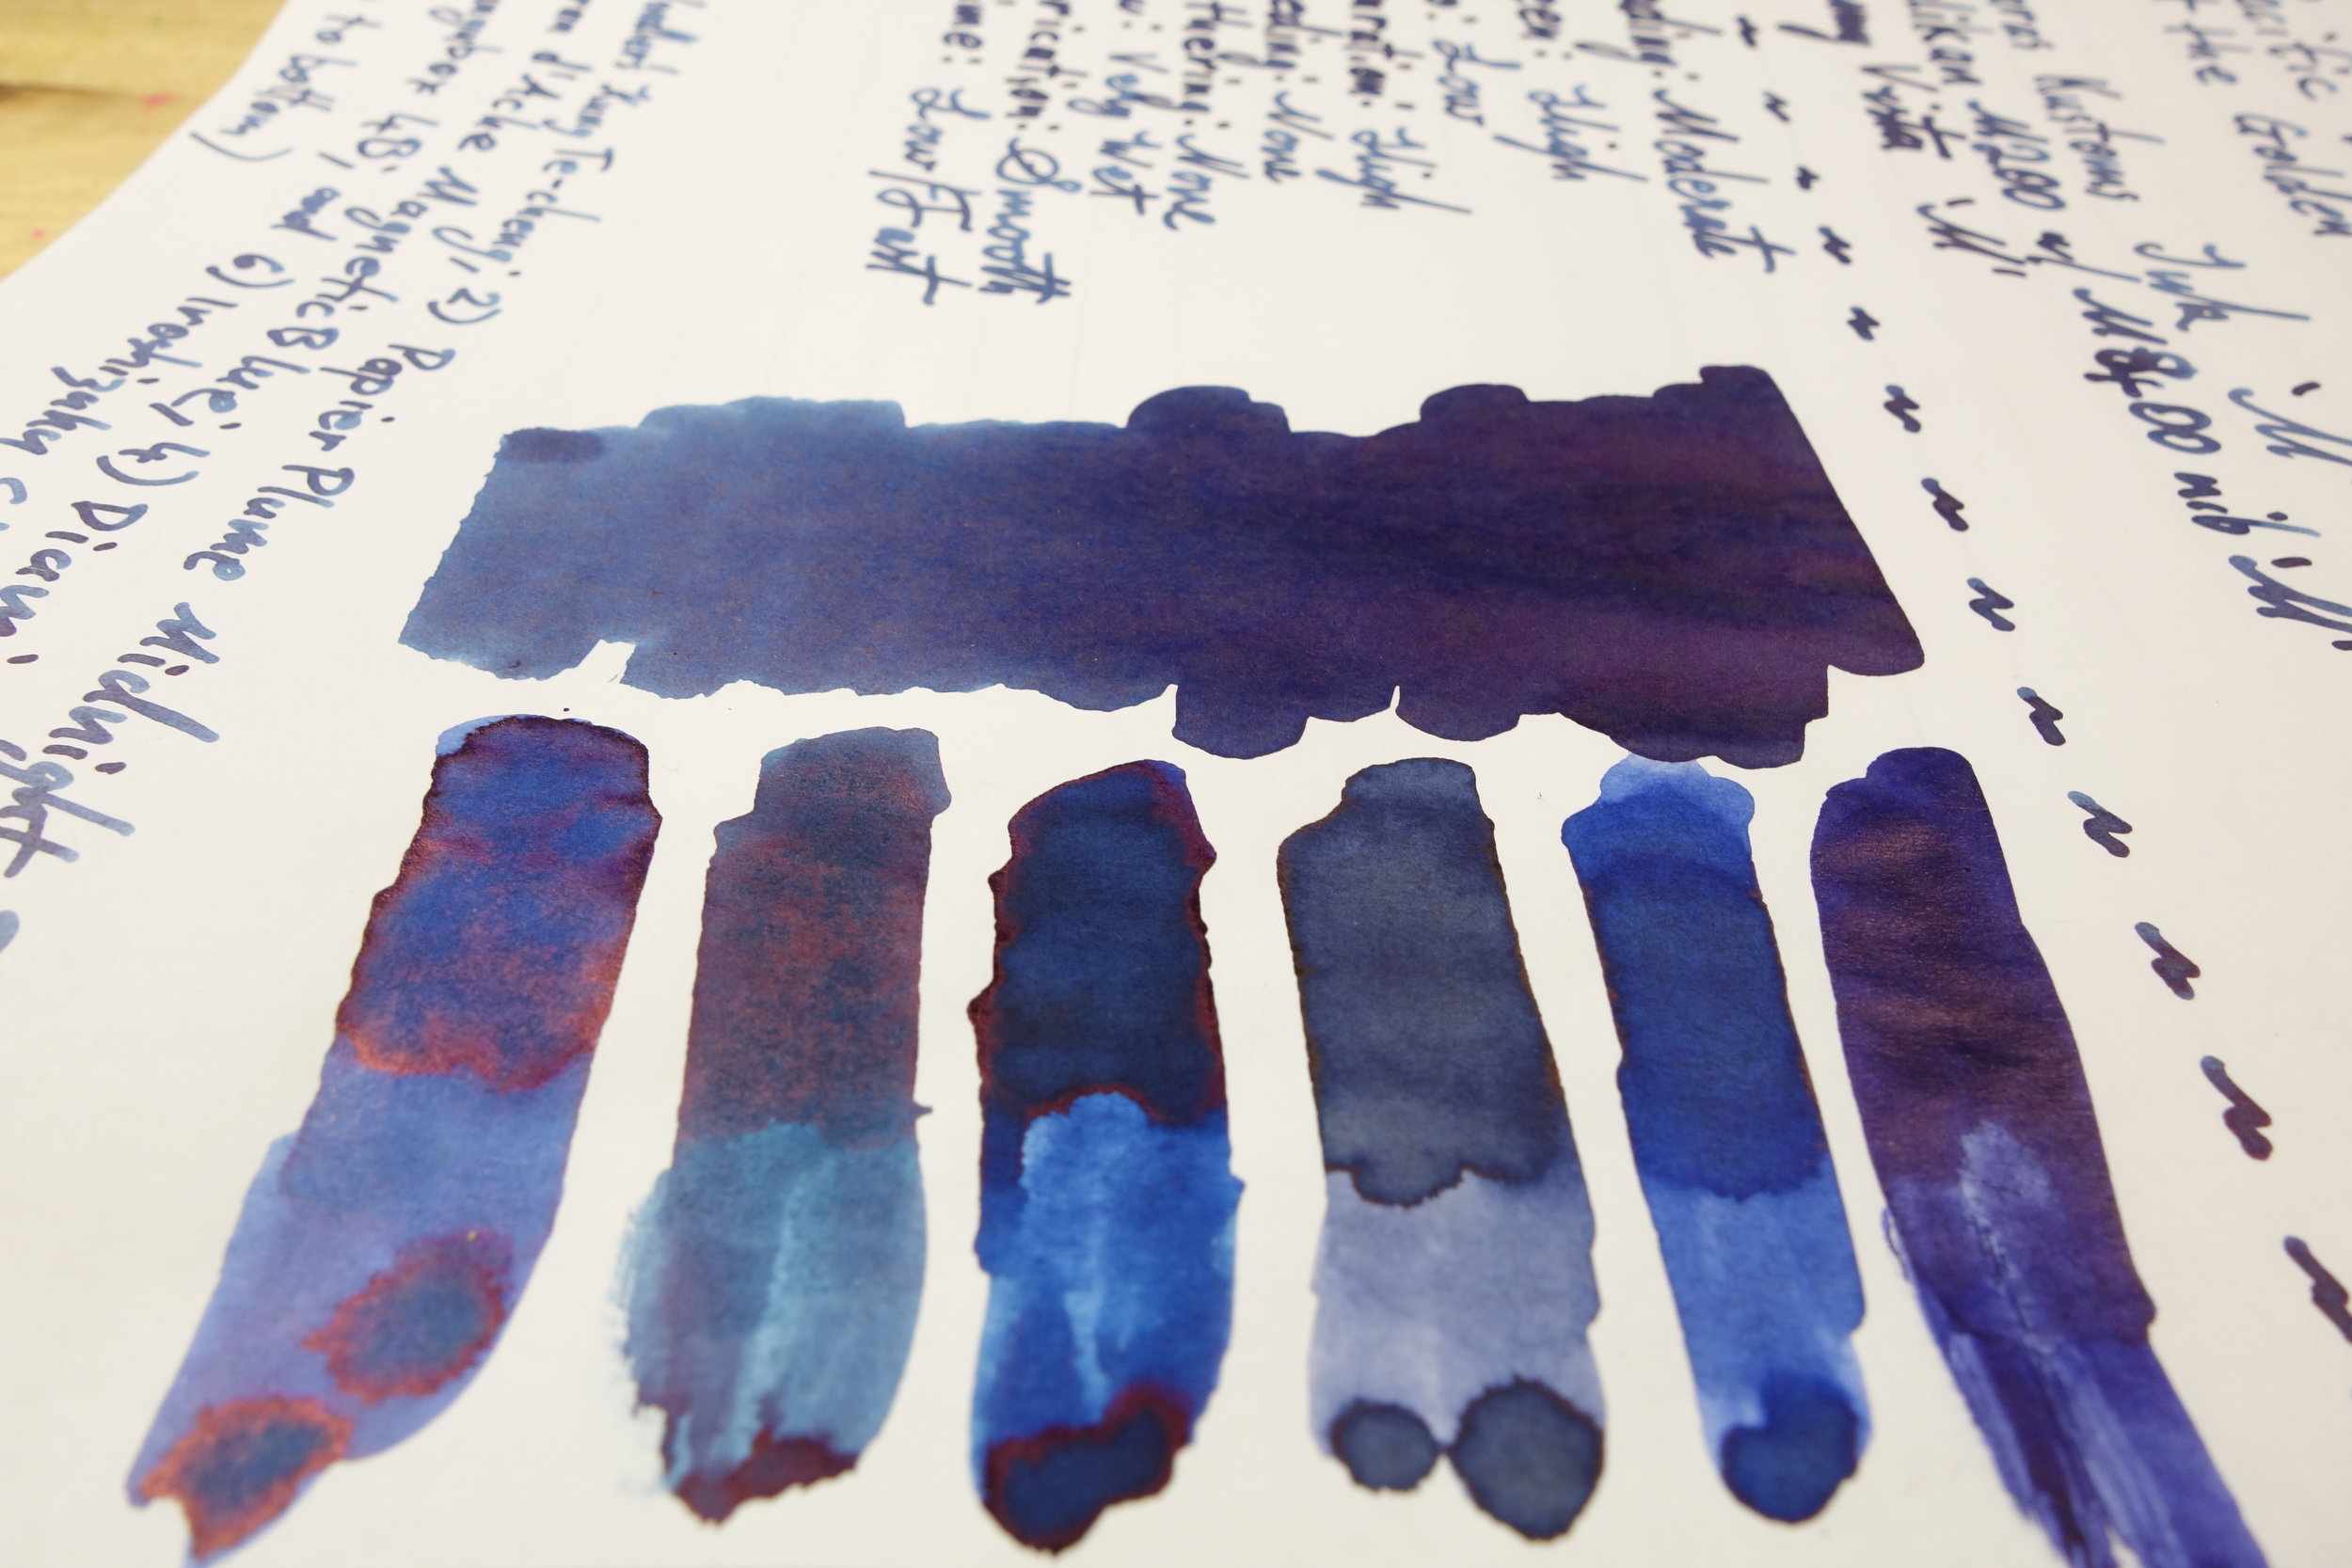 On Tomoe River (left to right): 1) Iroshizuku Shin-kai; 2) Bungubox 4B; 3) Diamine Oxford Blue; 4) Caran d'Ache Magnetic Blue; 5) Papier Plume Midnight Blue; and 6) Noodler's Kung Te-Cheng.